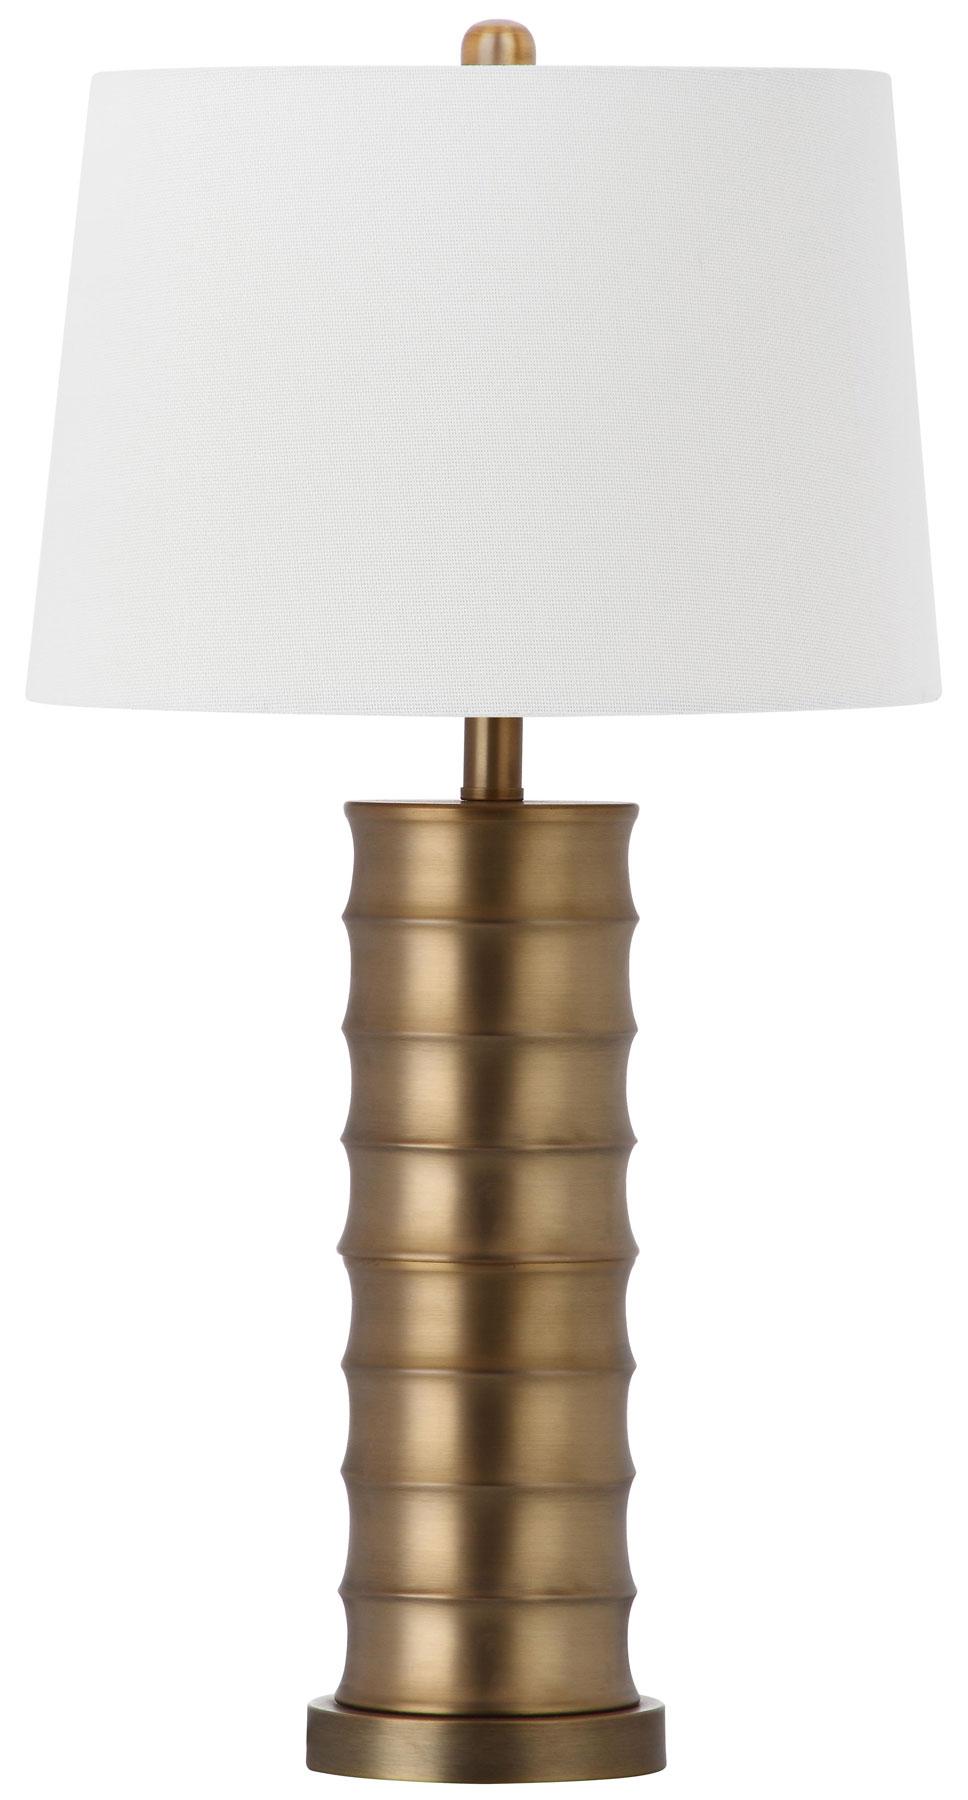 LINUS BRASS COLUMN TABLE LAMP LIT4319A SET2